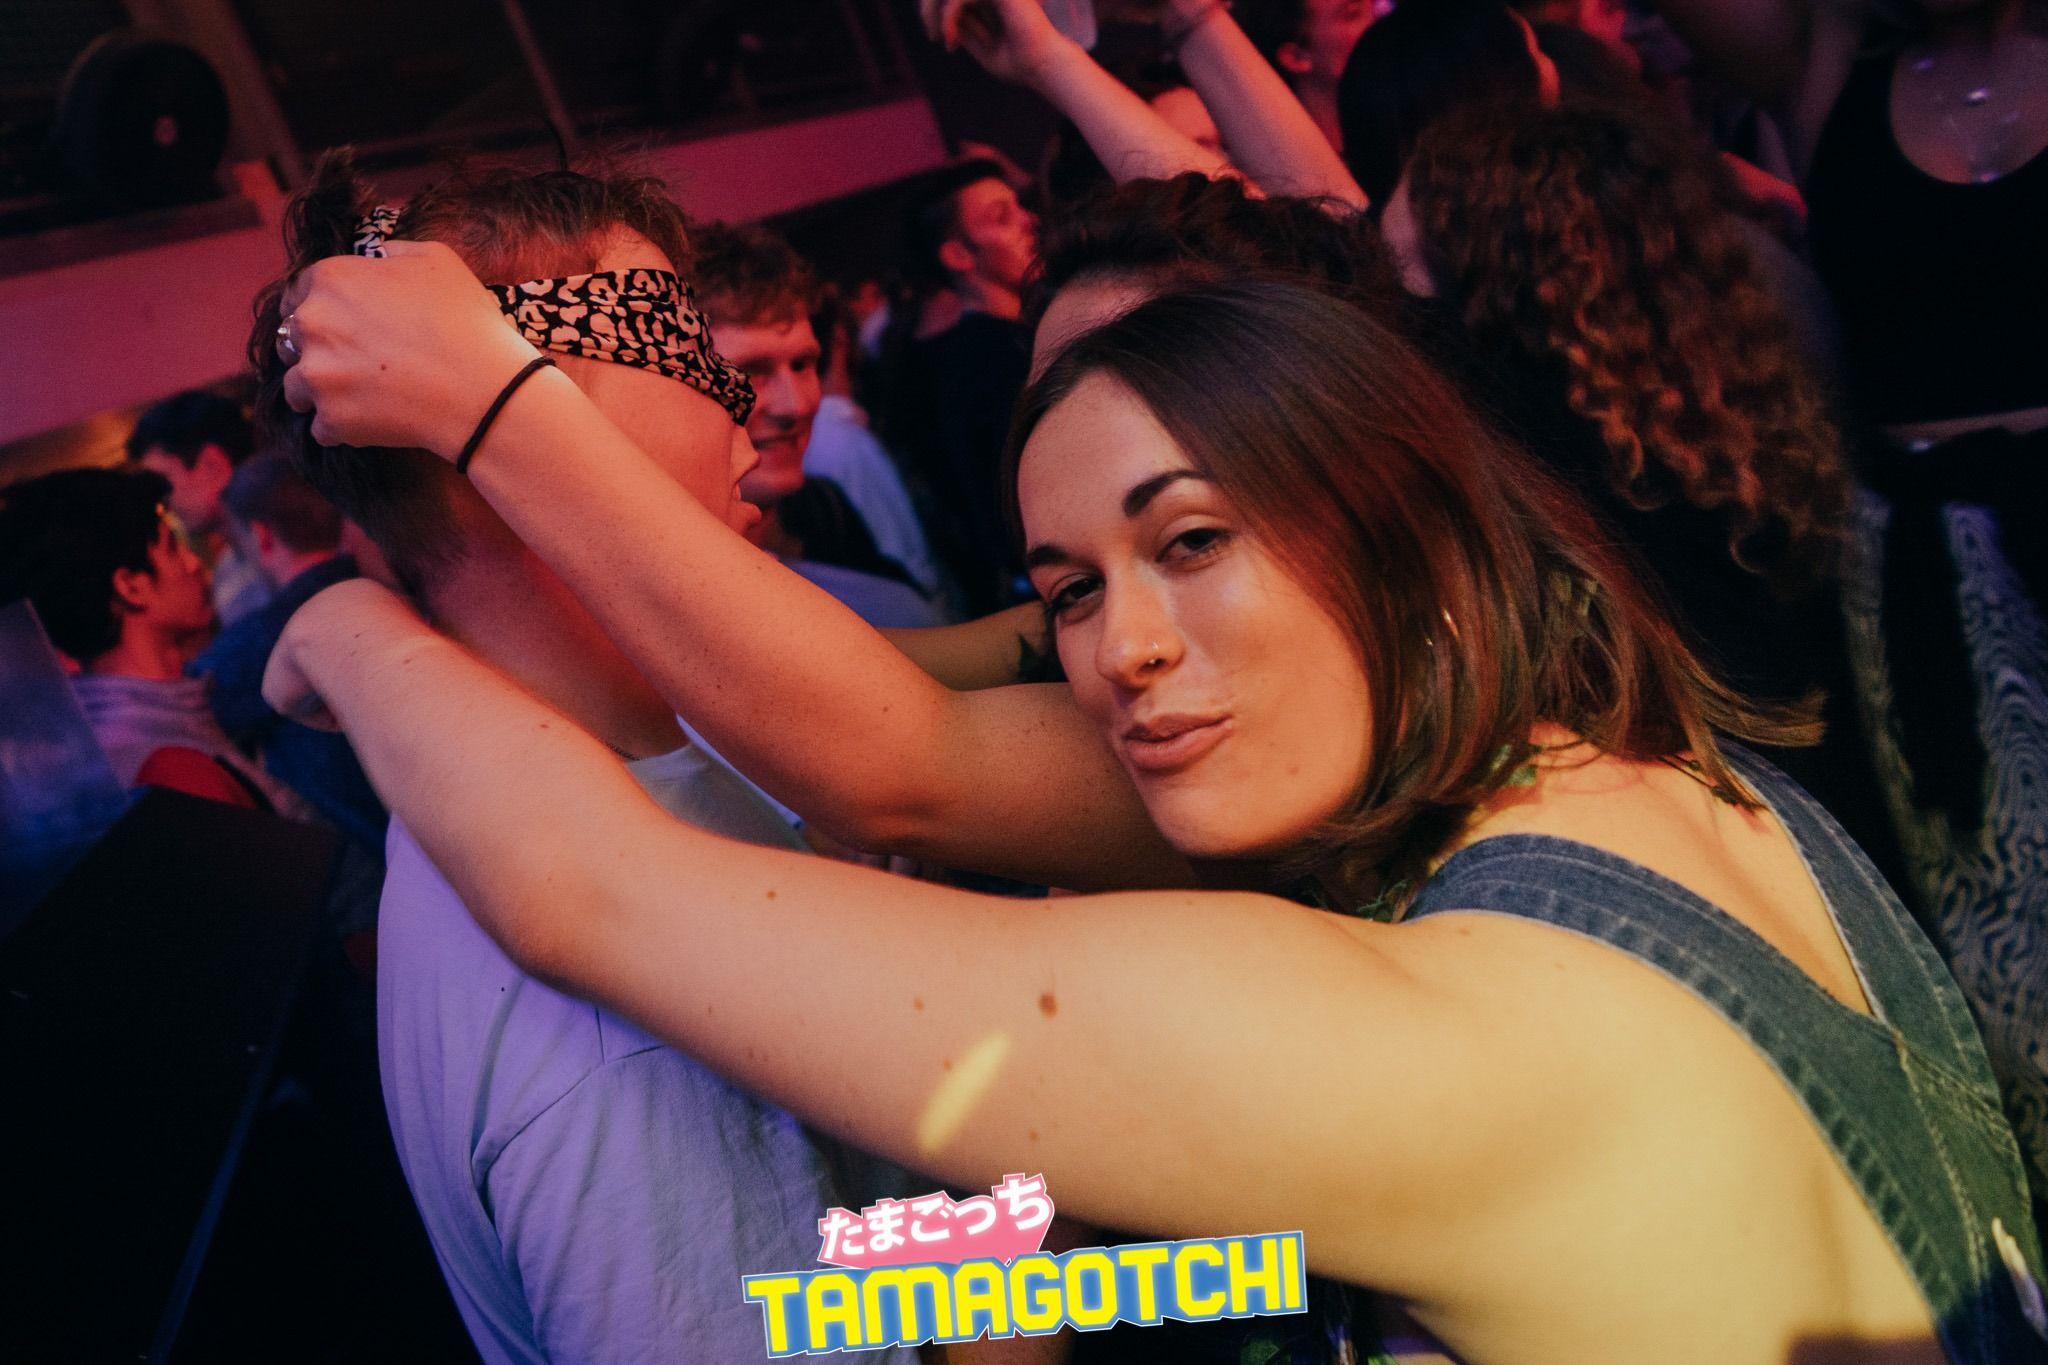 Image may contain: Pub, Night Club, Night Life, Club, Person, Human